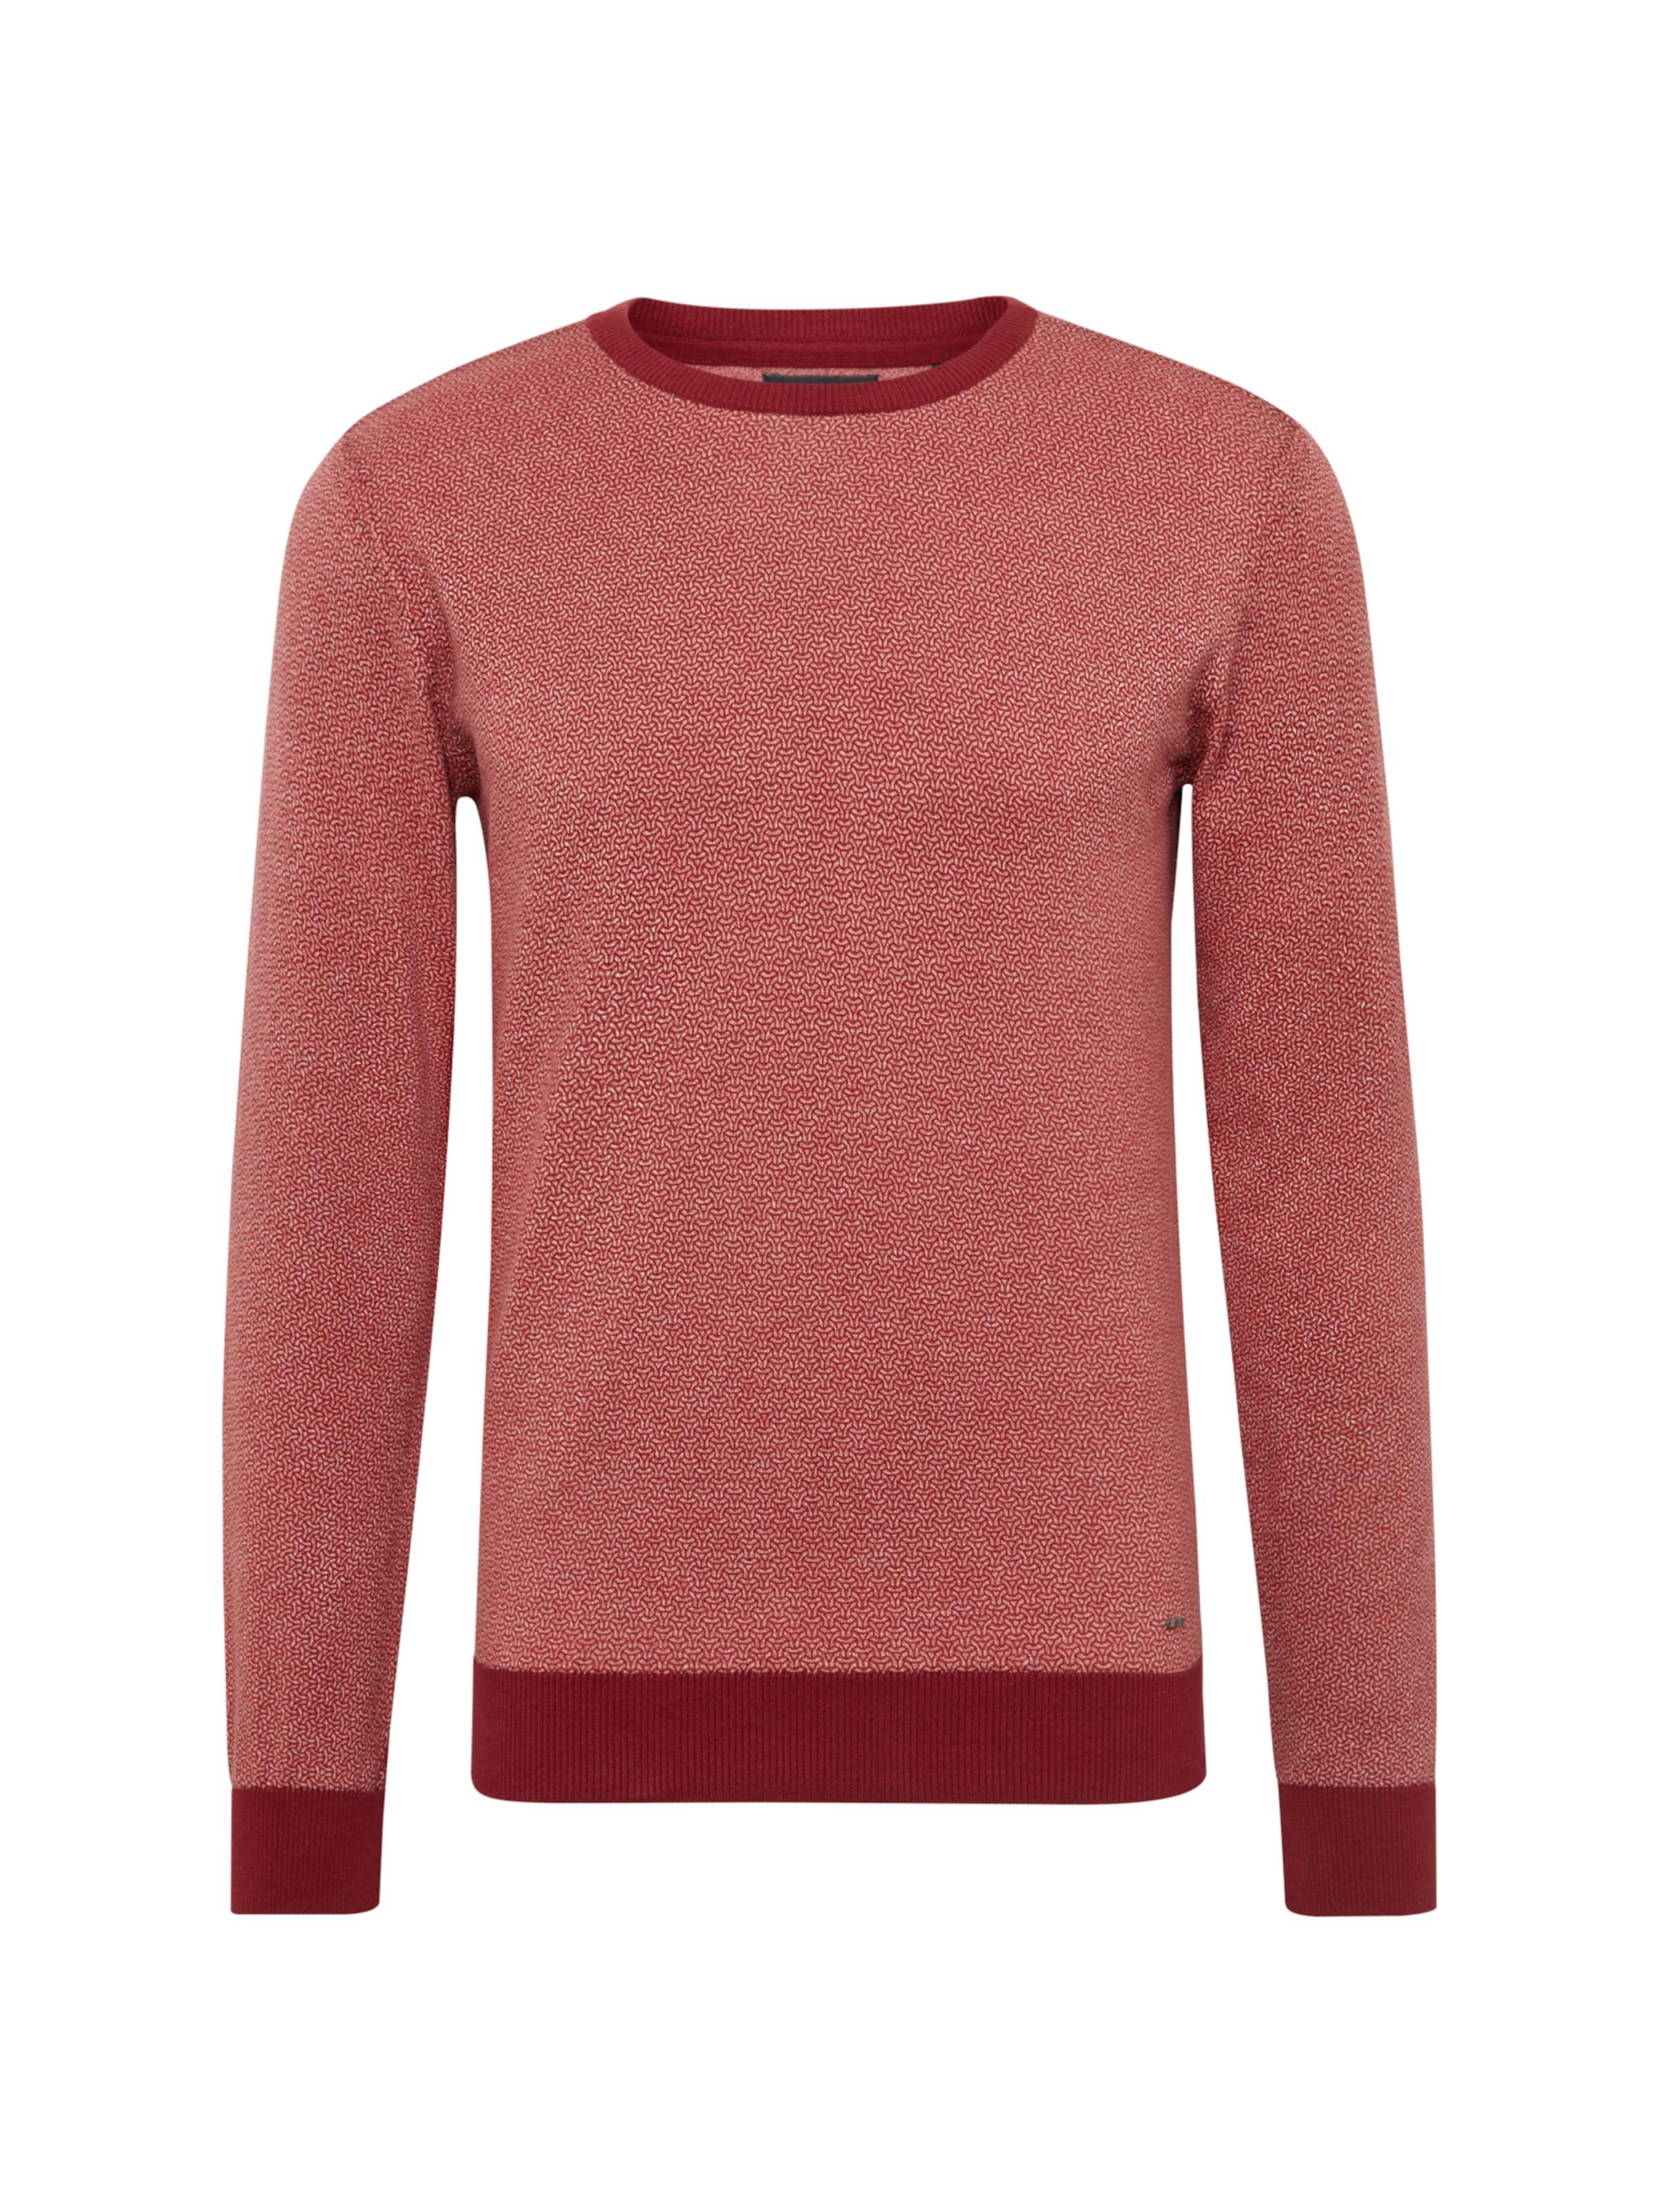 Sweat En Rouge Industries shirt Petrol LqA5R34j